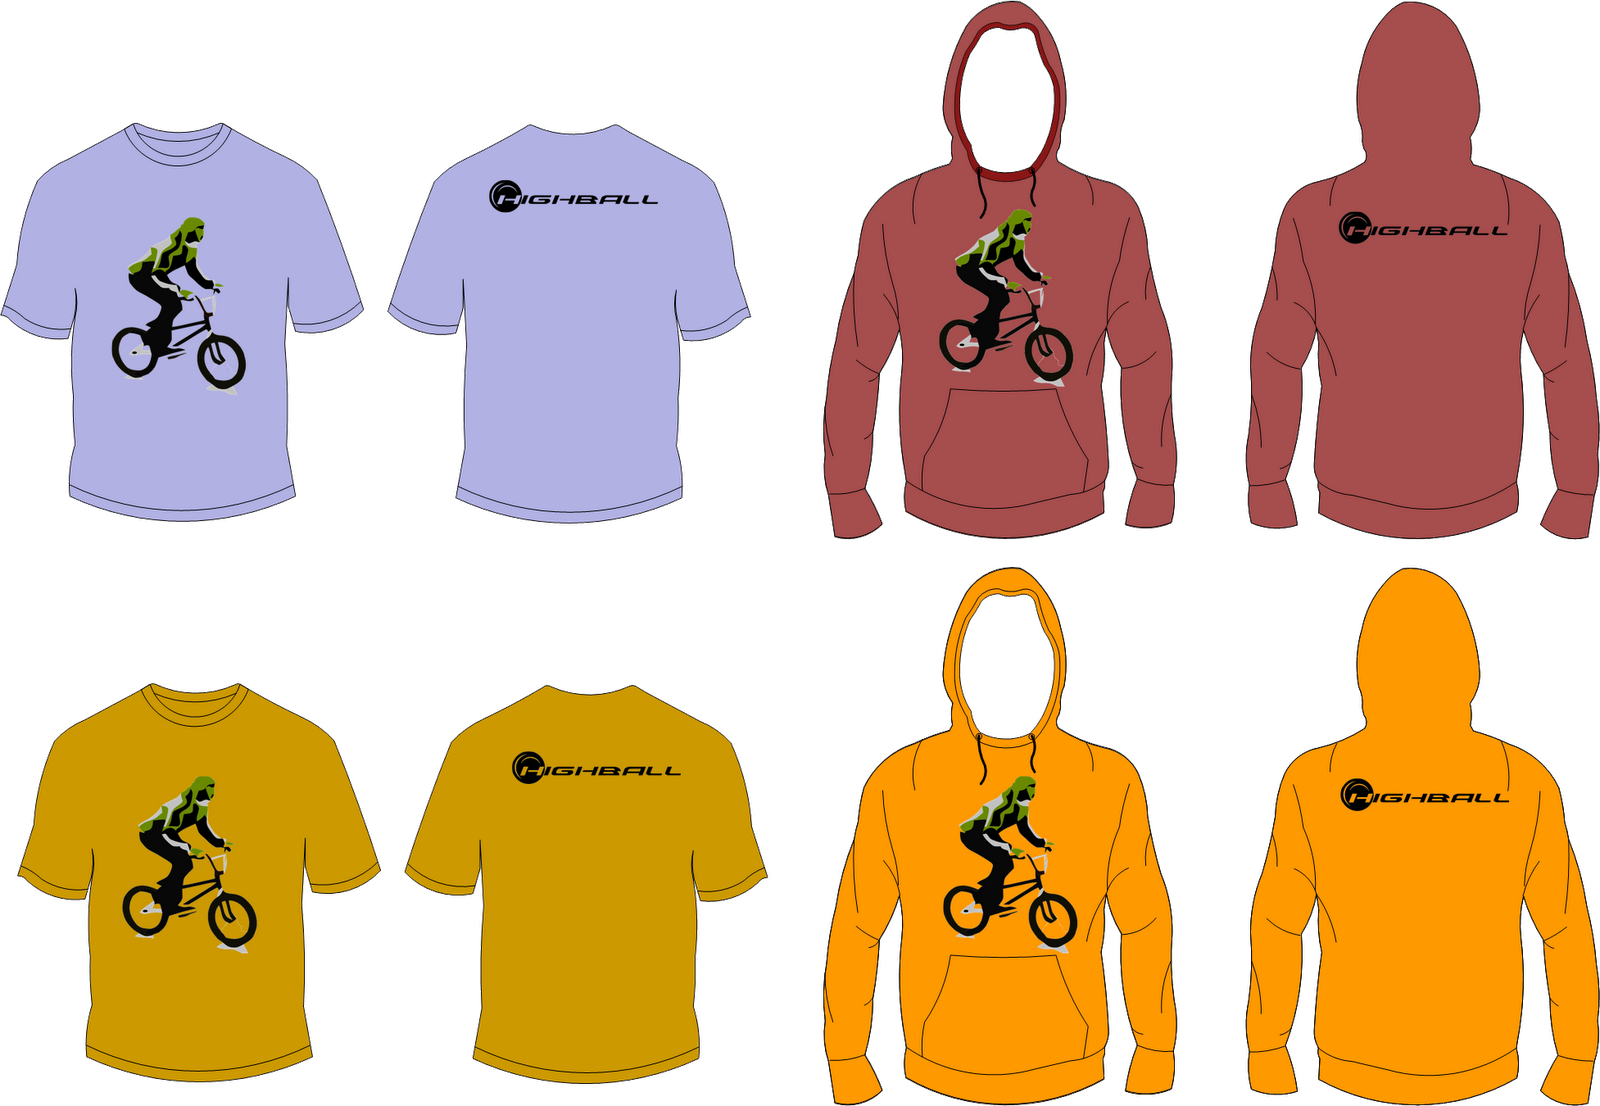 Shirt design blog - Shirt Design Blog 70